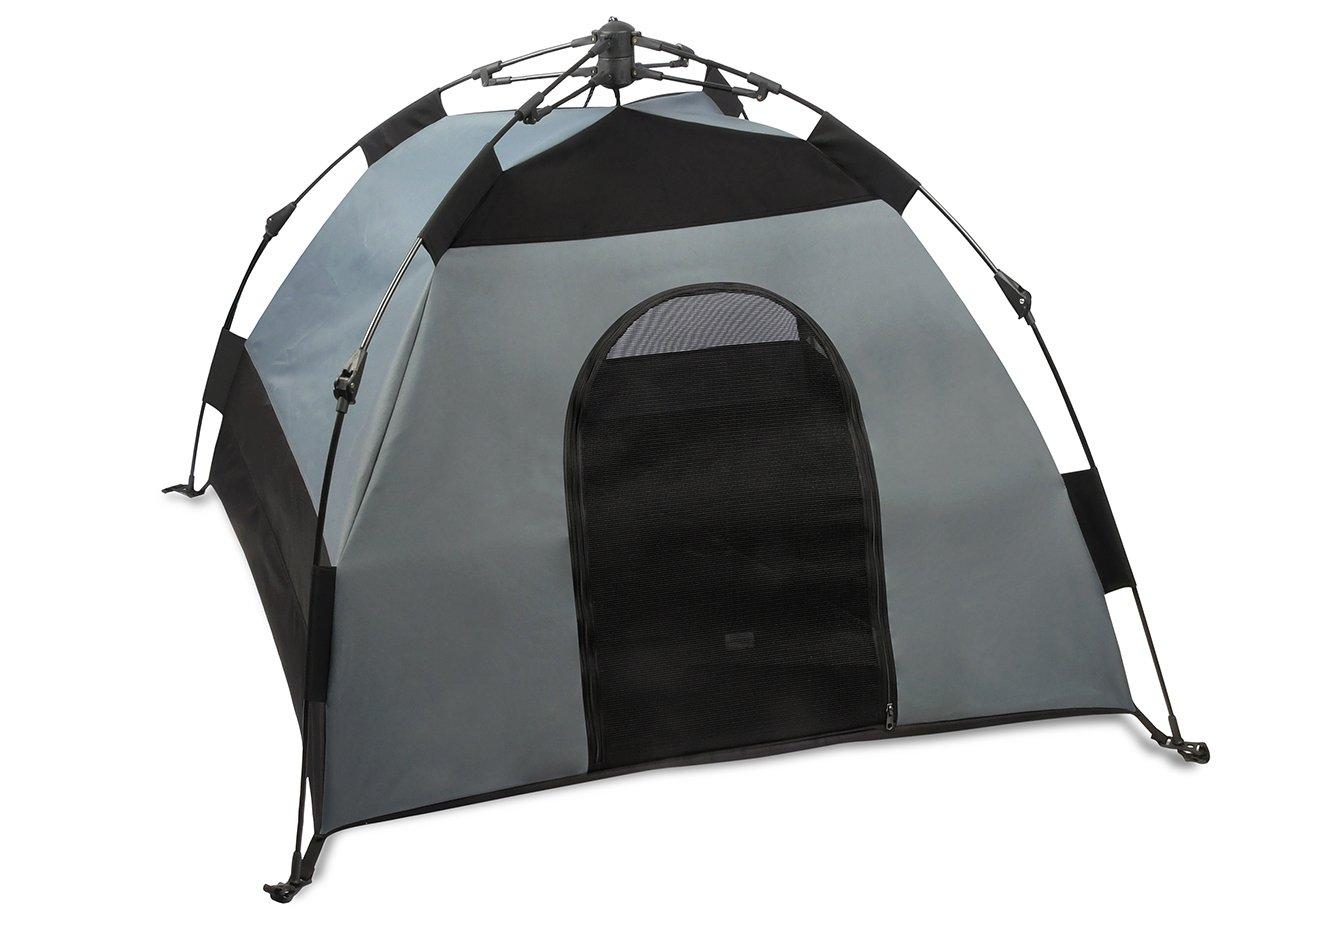 P.L.A.Y. Pop Up Tent, Grey Eclipse